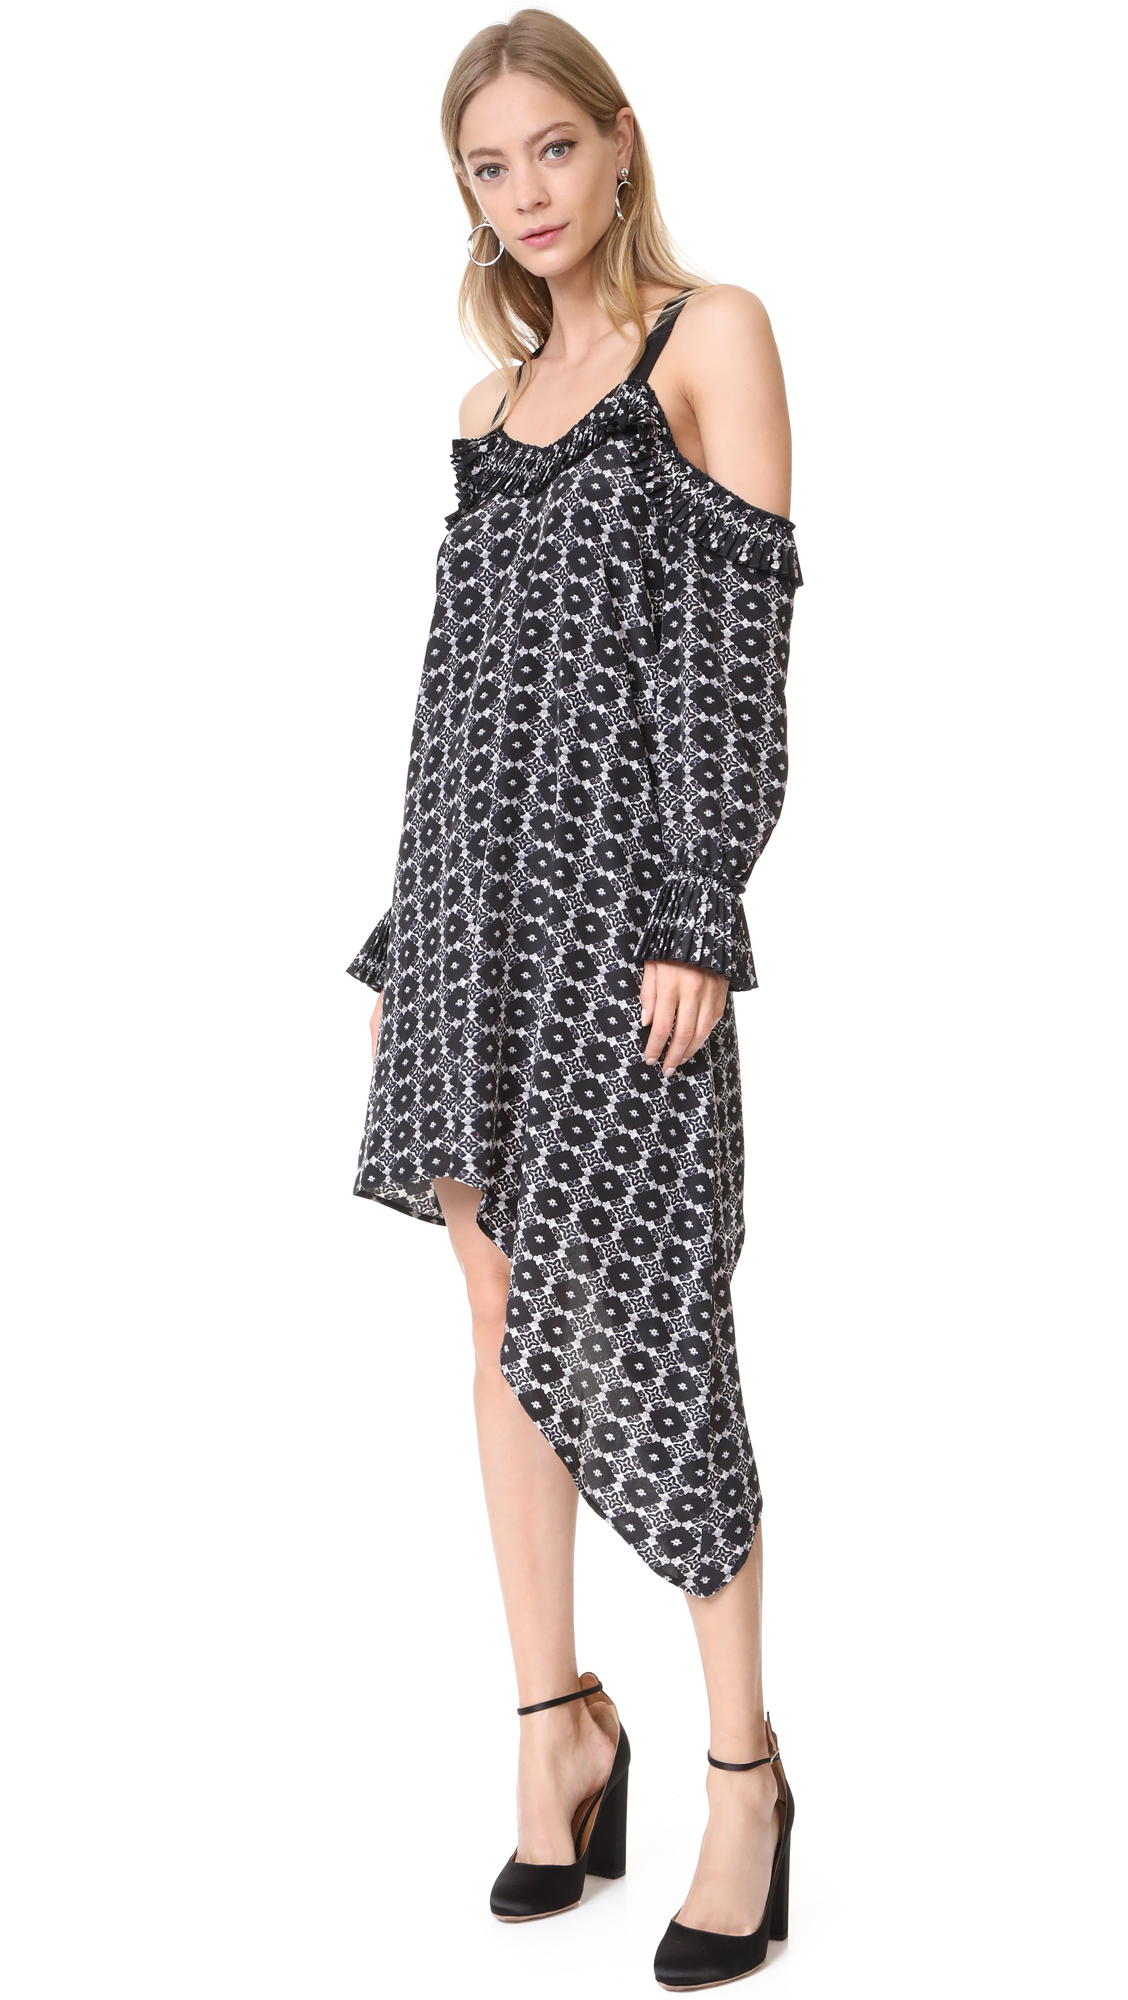 DELFI Collective Holly Dress - Multi